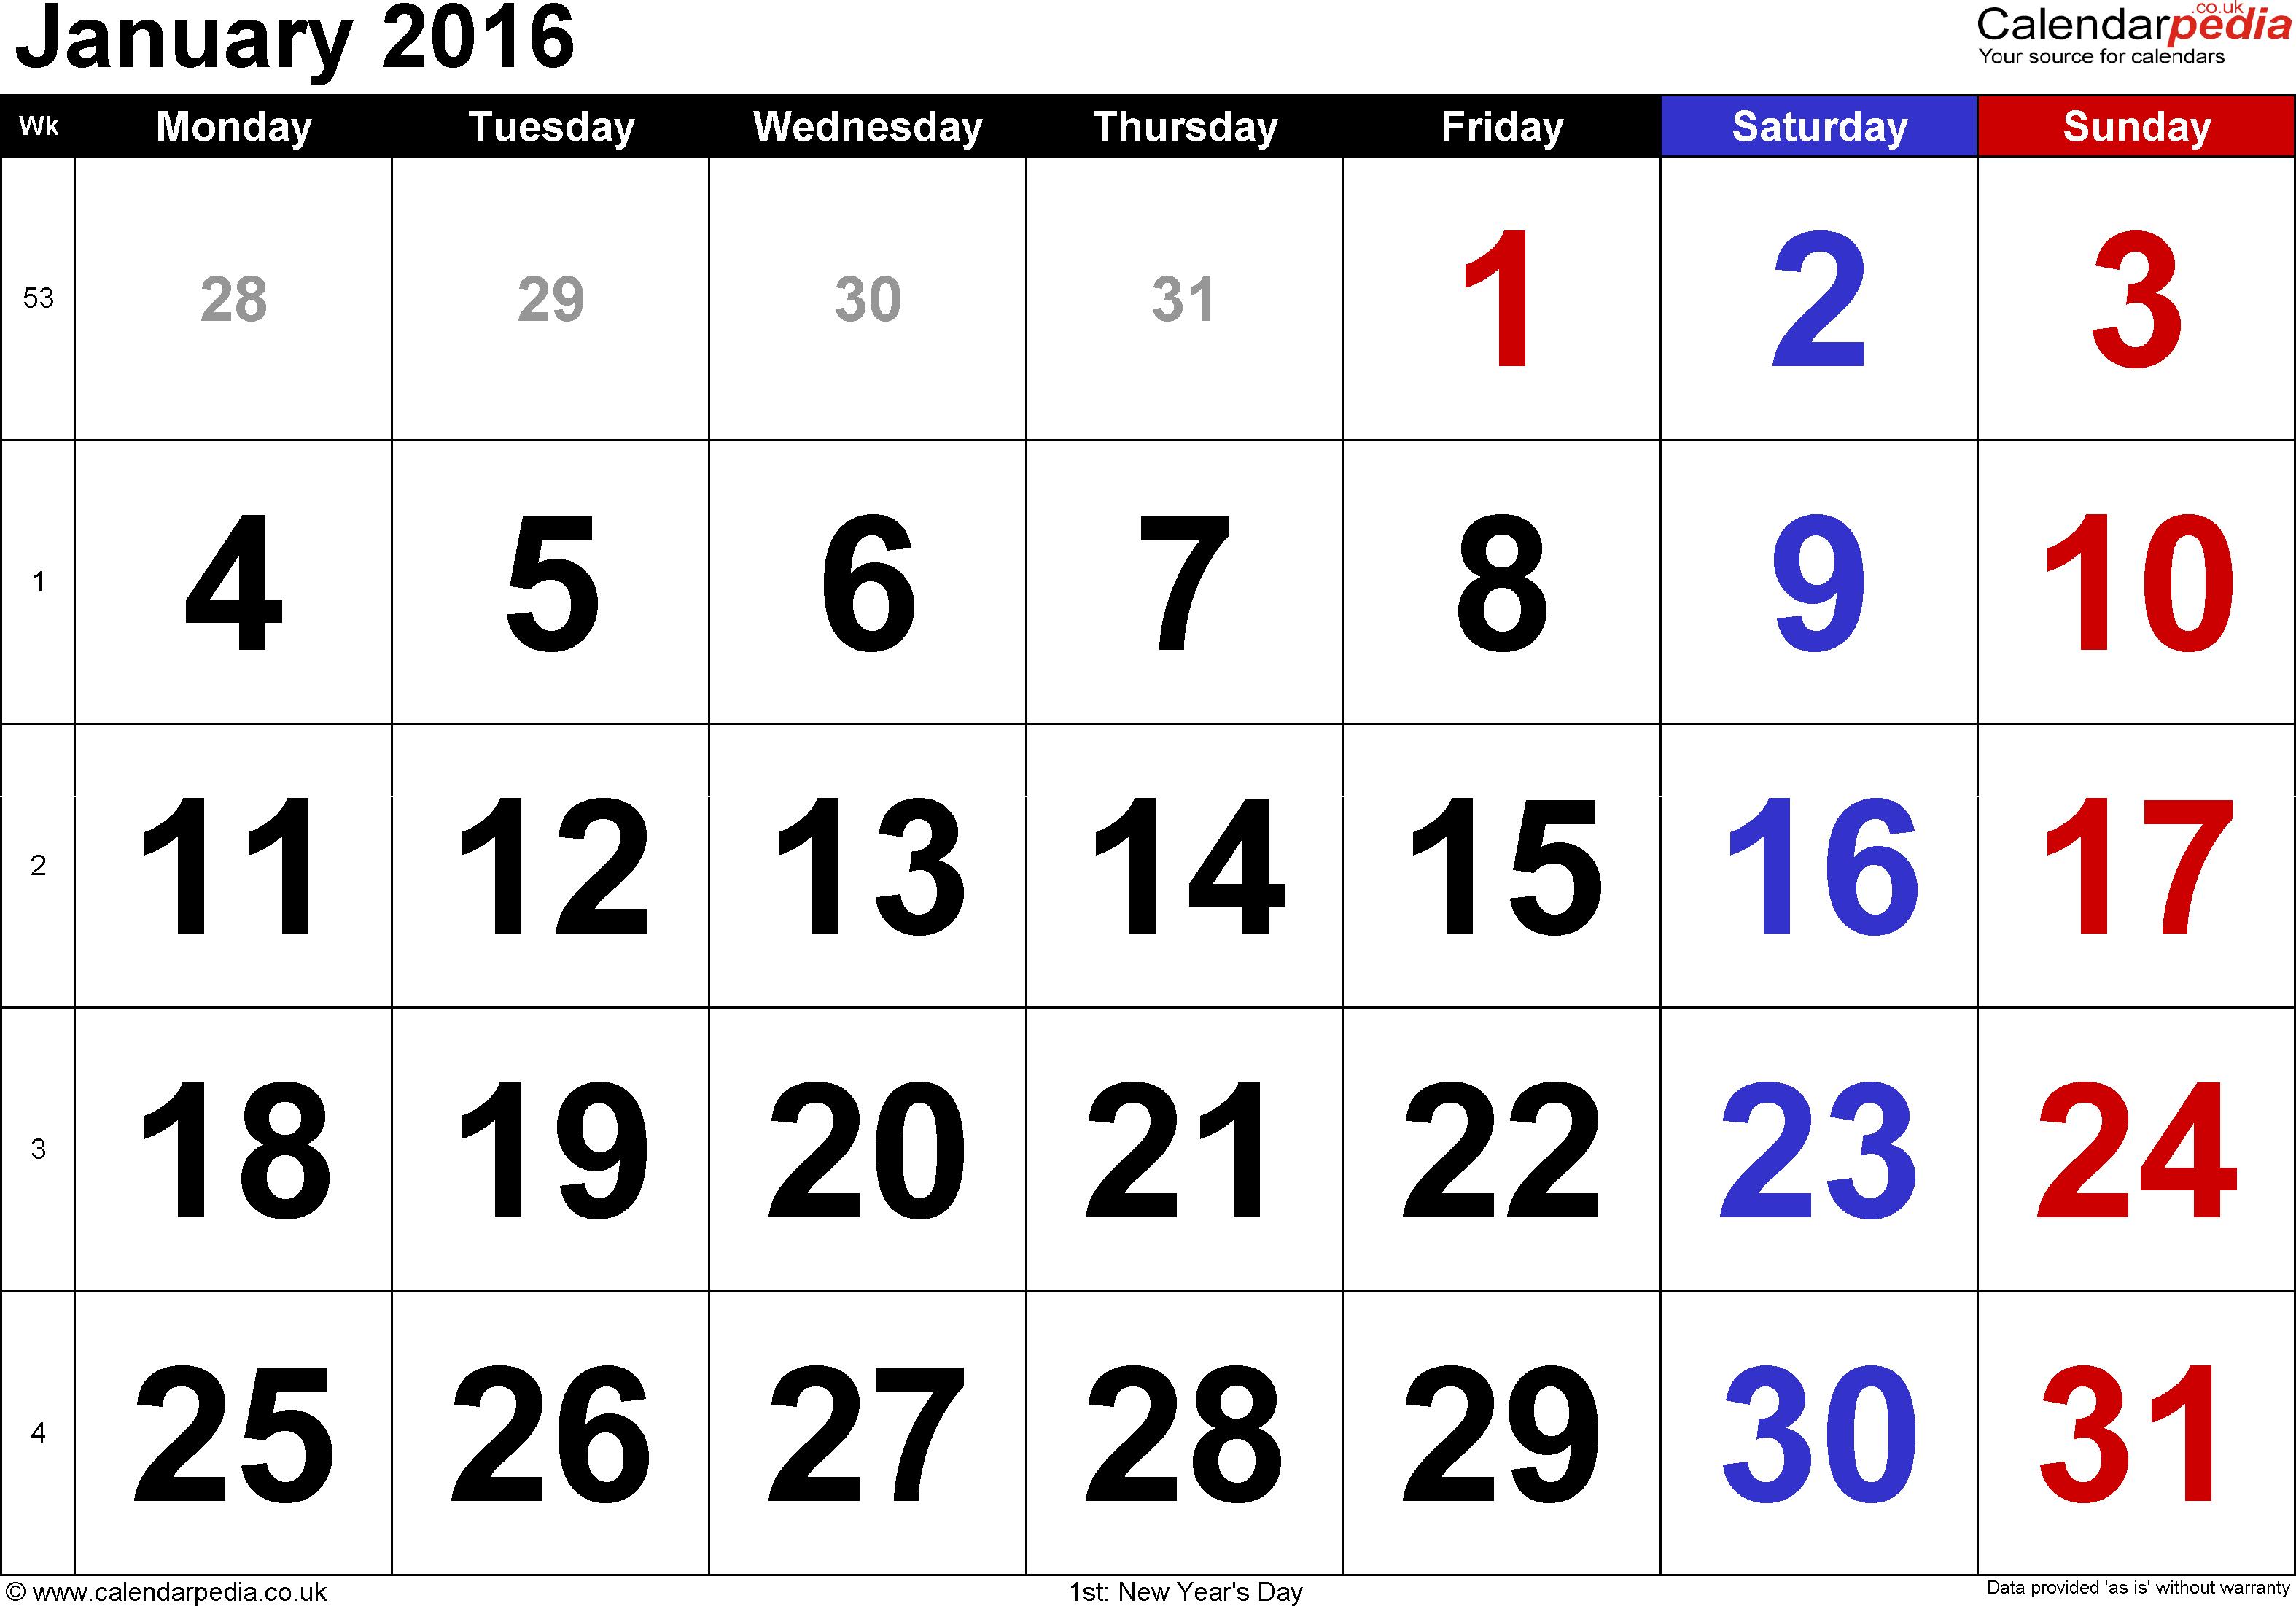 January 1 2015